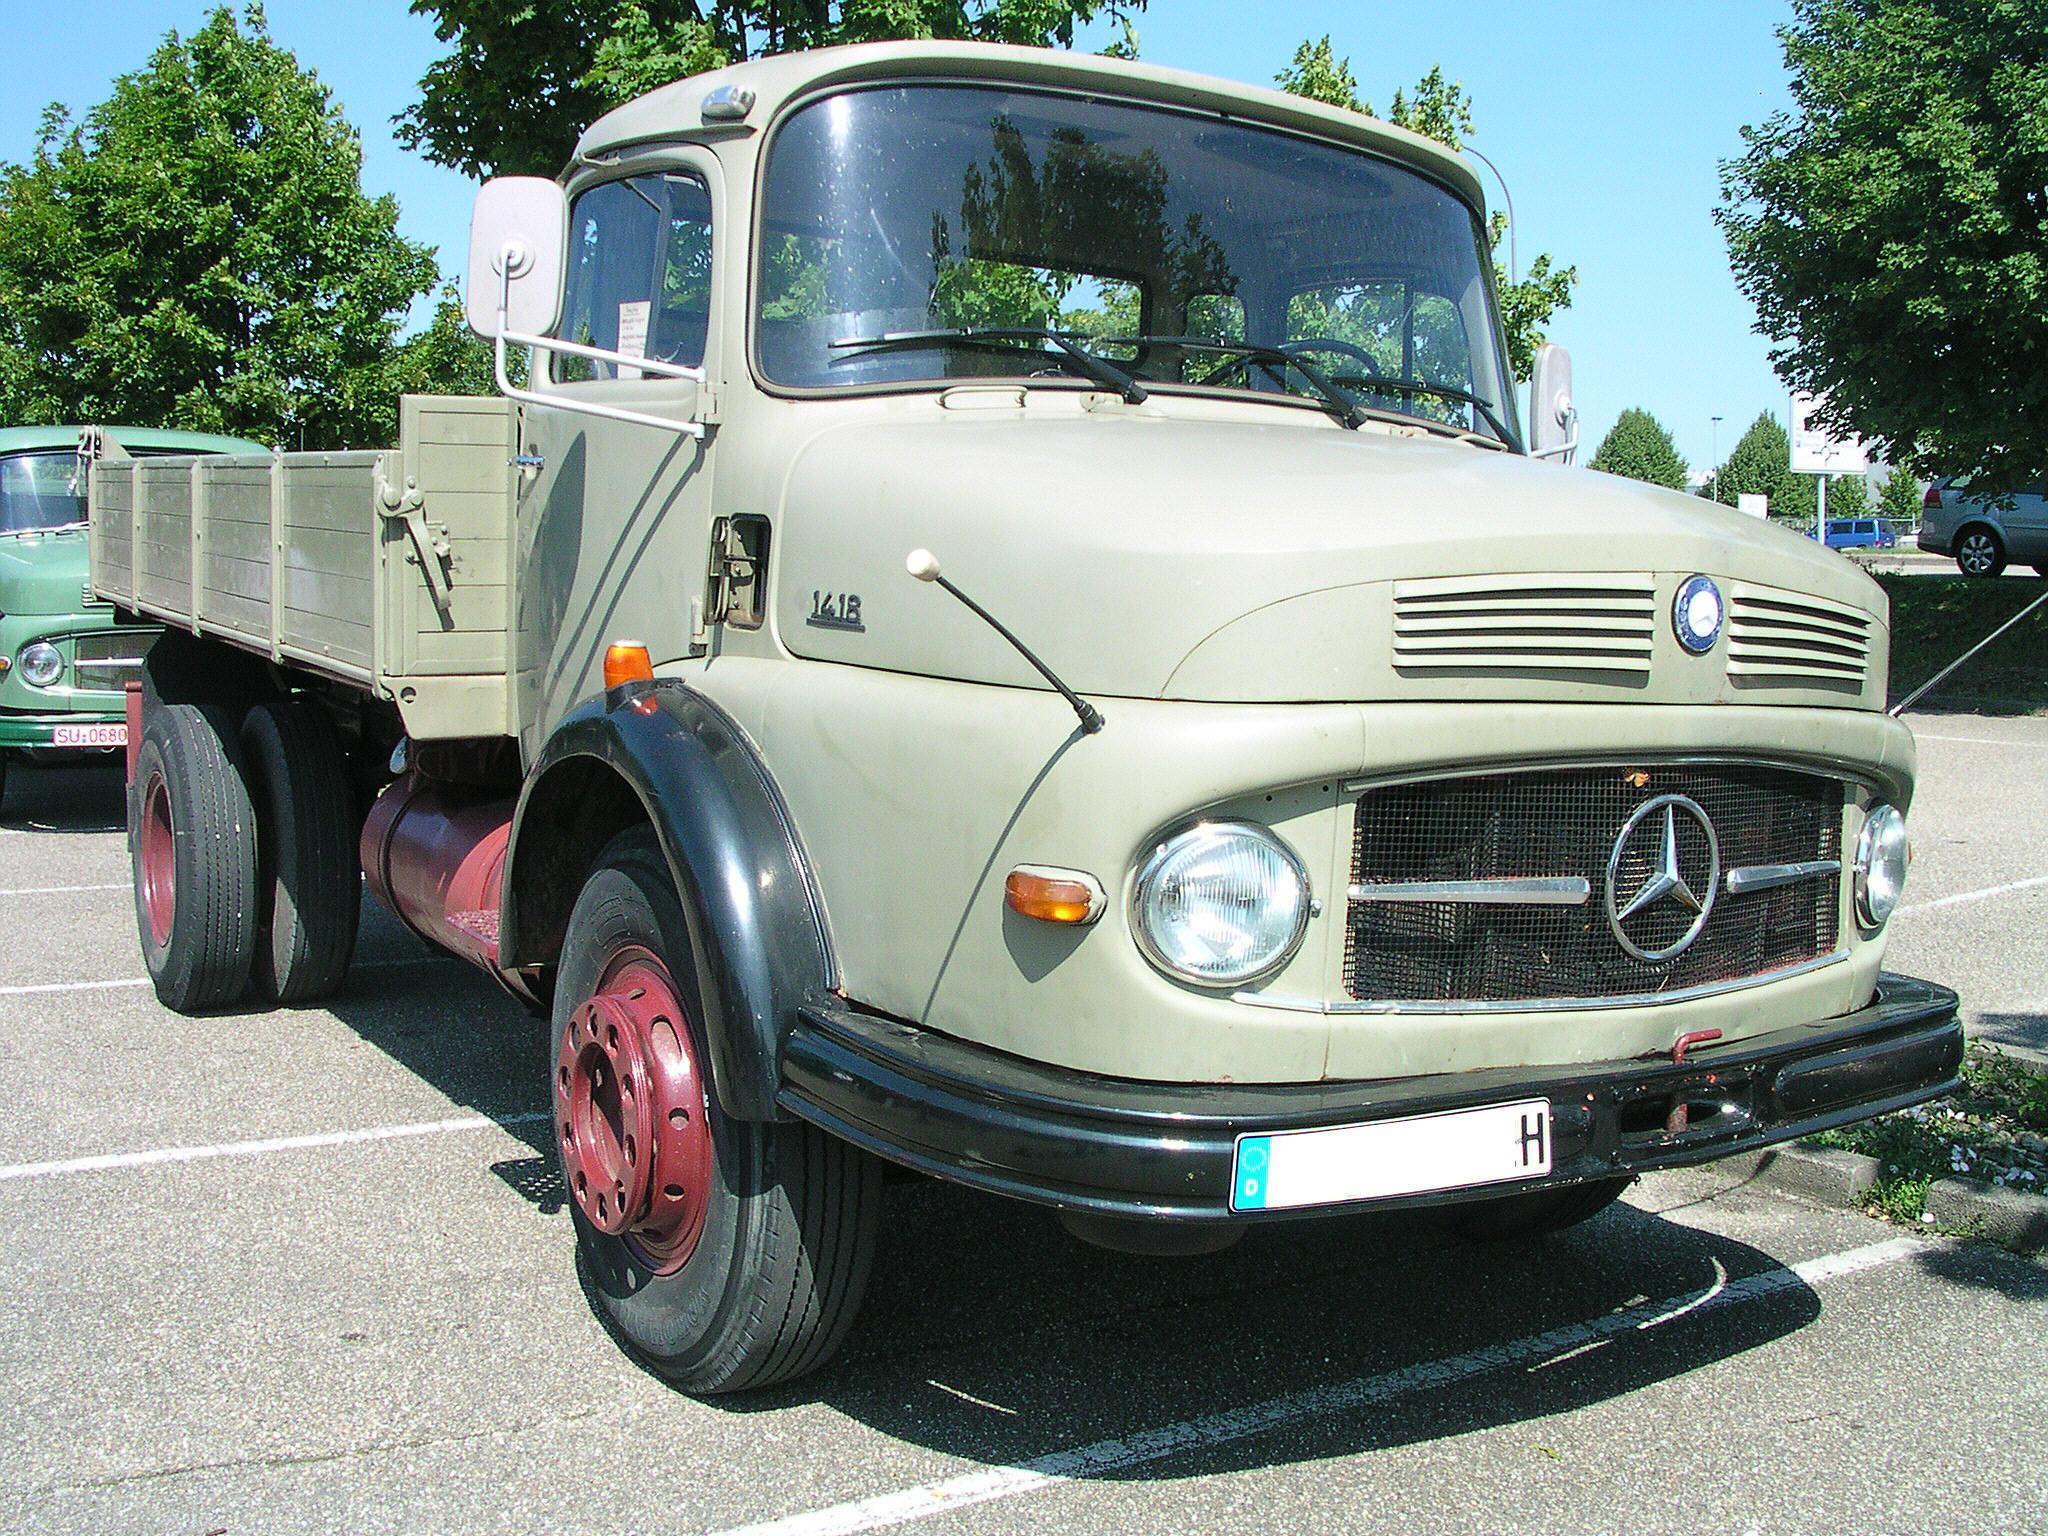 File:Mercedes 1418.jpg